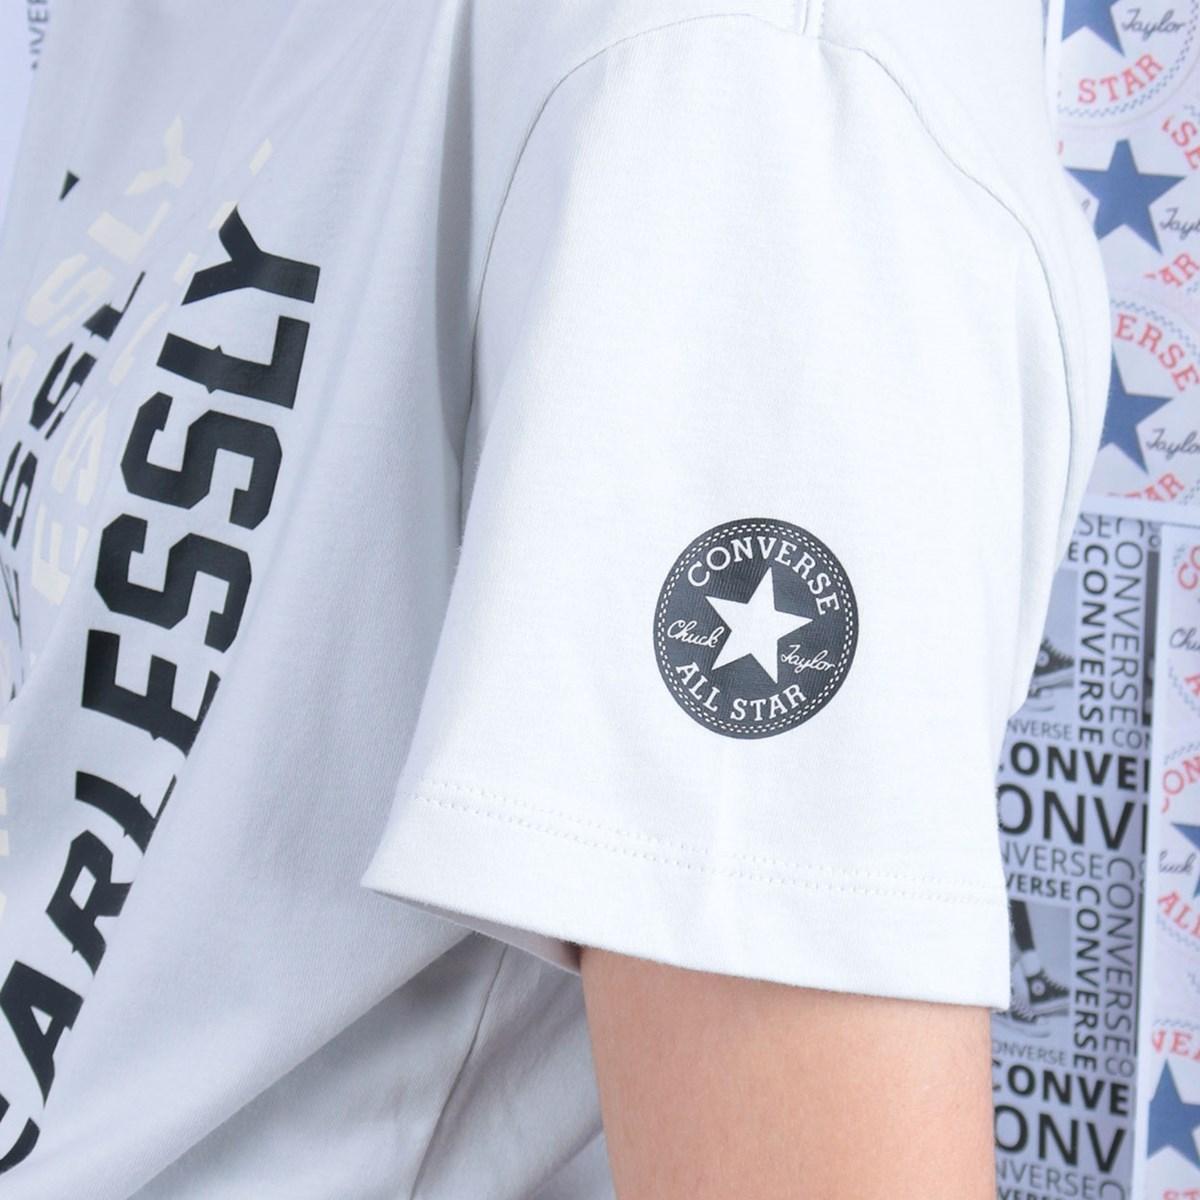 Camiseta Converse Love The Progress 2.0 Relaxed Tee Photon Dust 10019658-A03